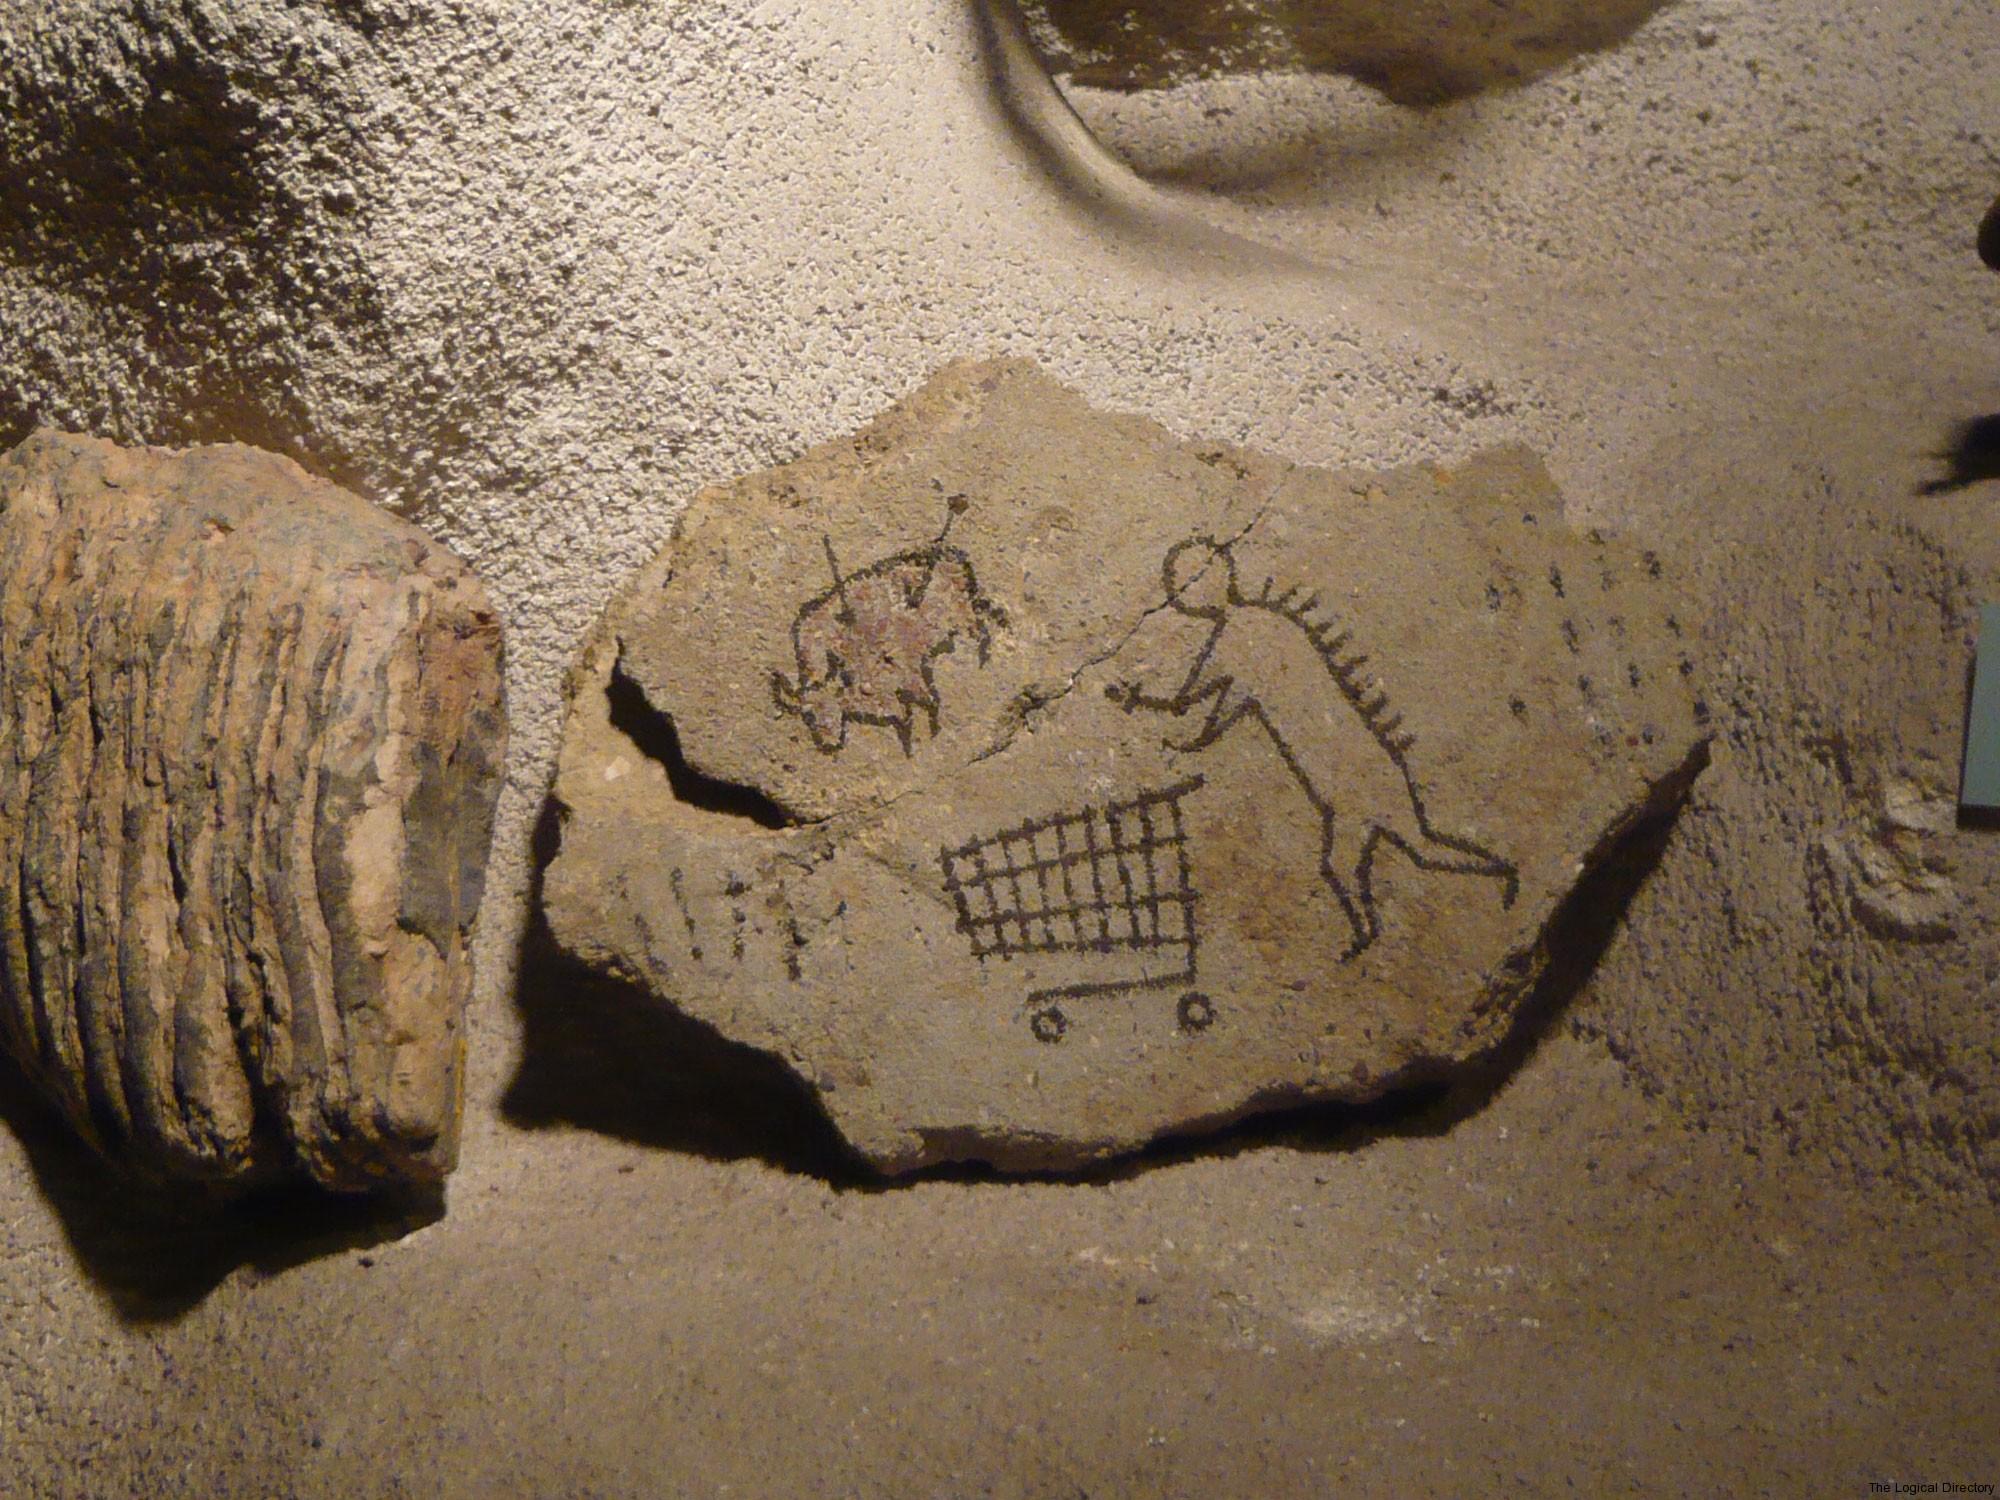 Banksy - Stone-age Shopping